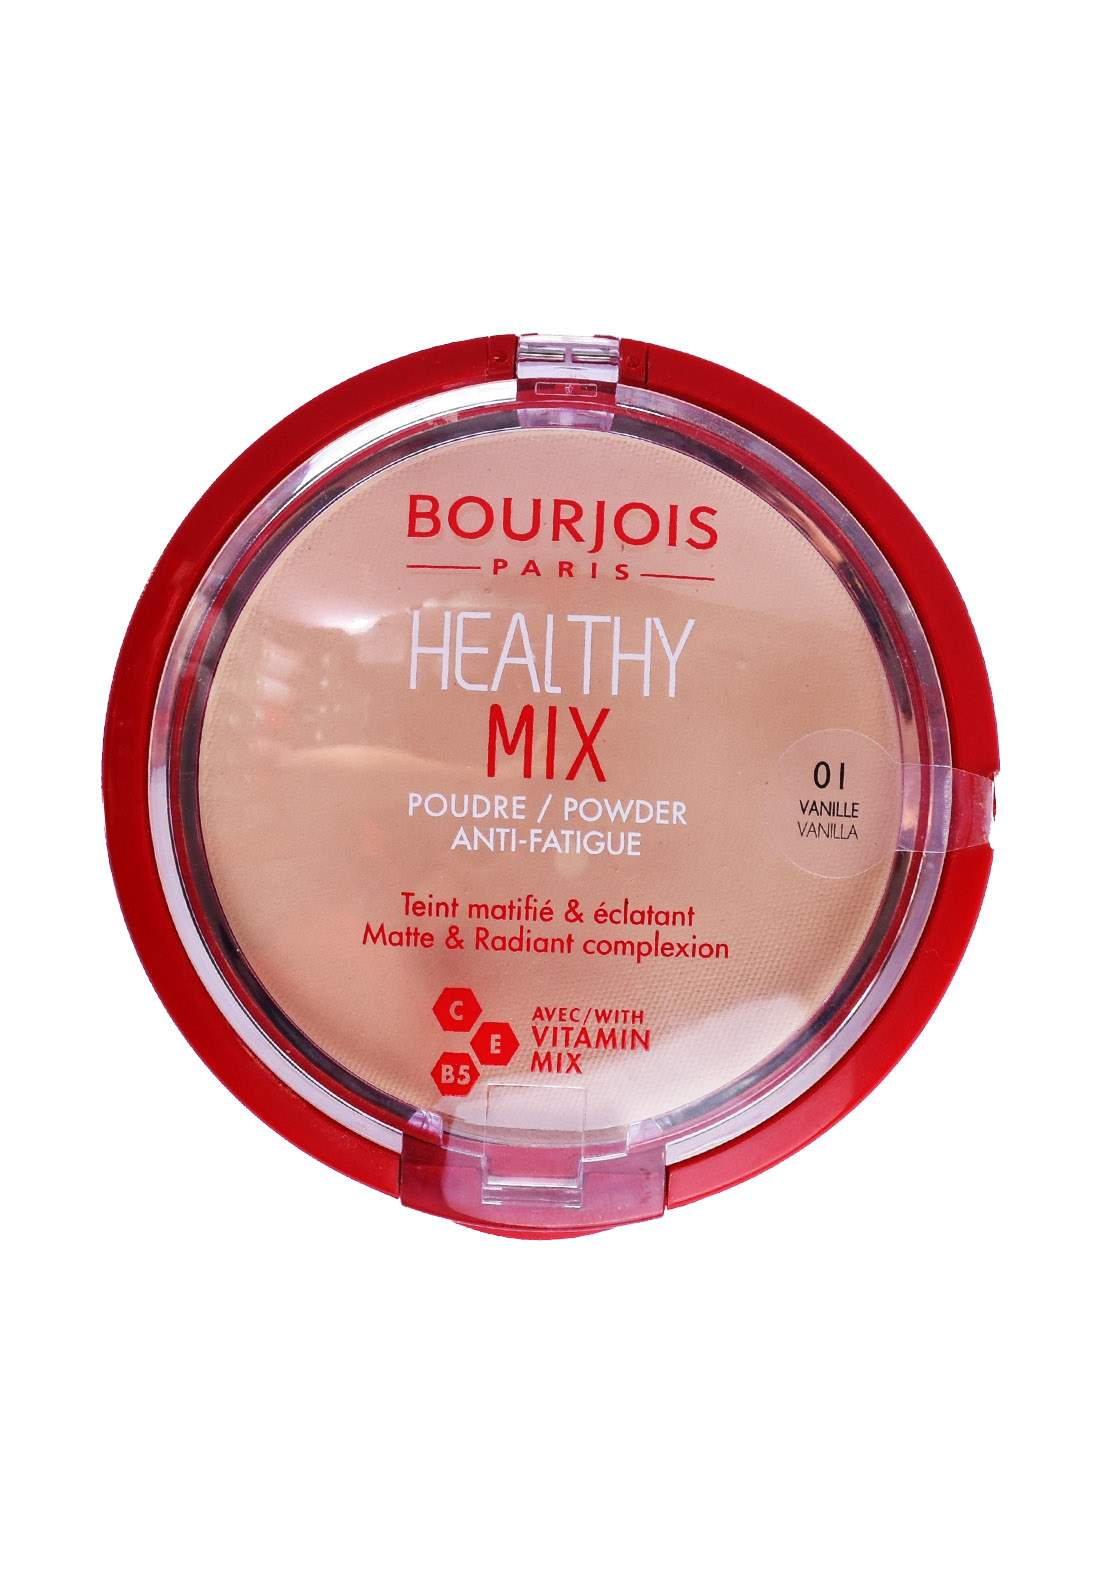 Bourjois Paris Healthy Mix Anti-Fatigue Powder - 01 Vanilla باودر